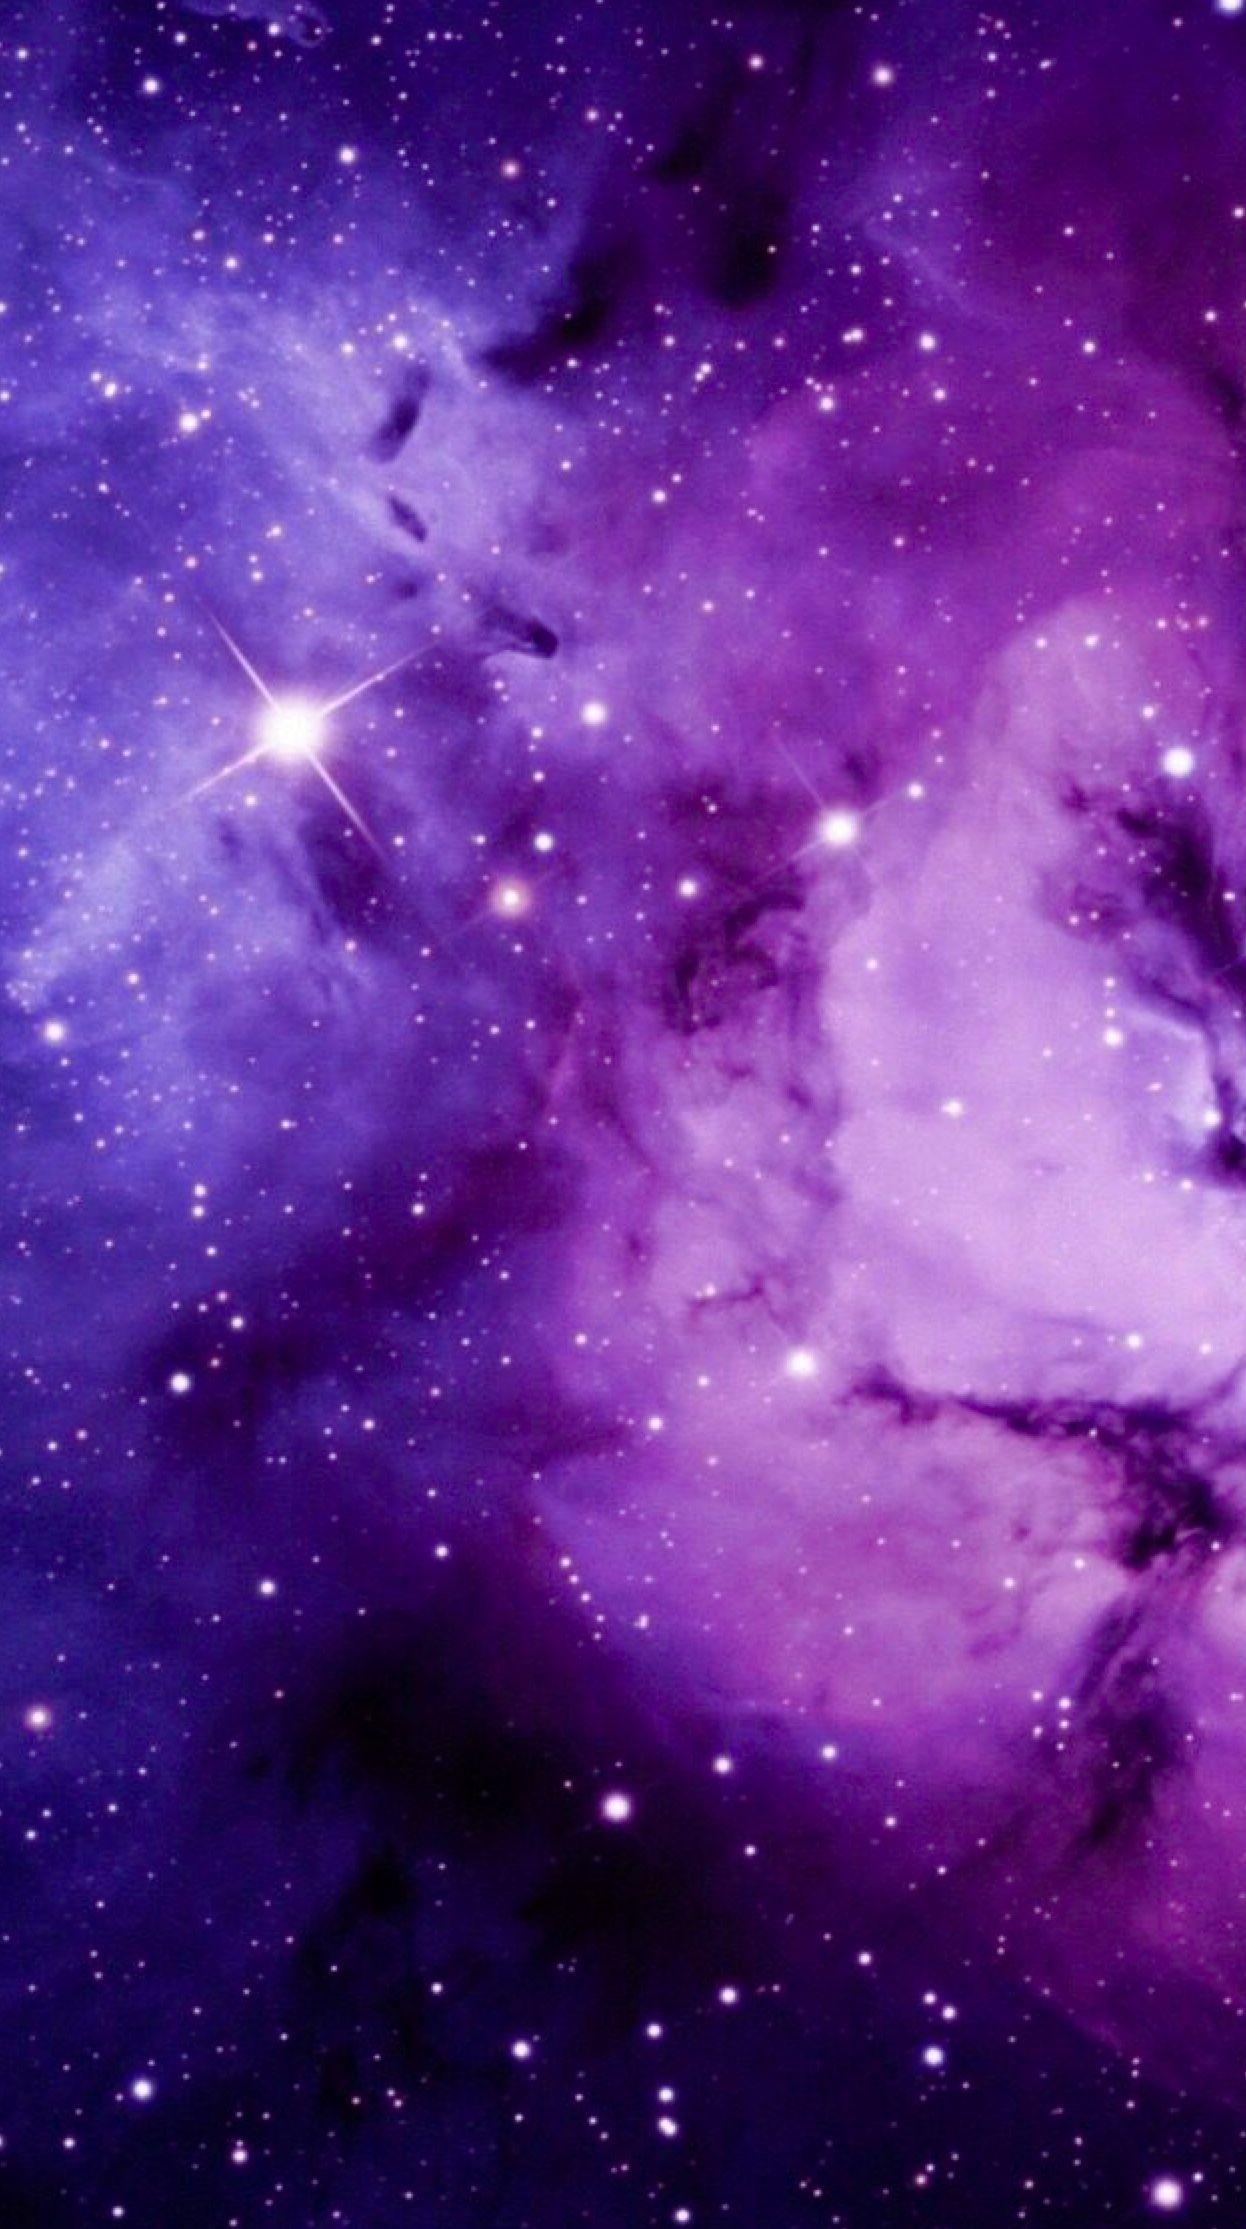 Pin By Marta Rosa Dos Santos On Aallpurple Everything Purple Galaxy Wallpaper Iphone Wallpaper Sky Galaxy Wallpaper